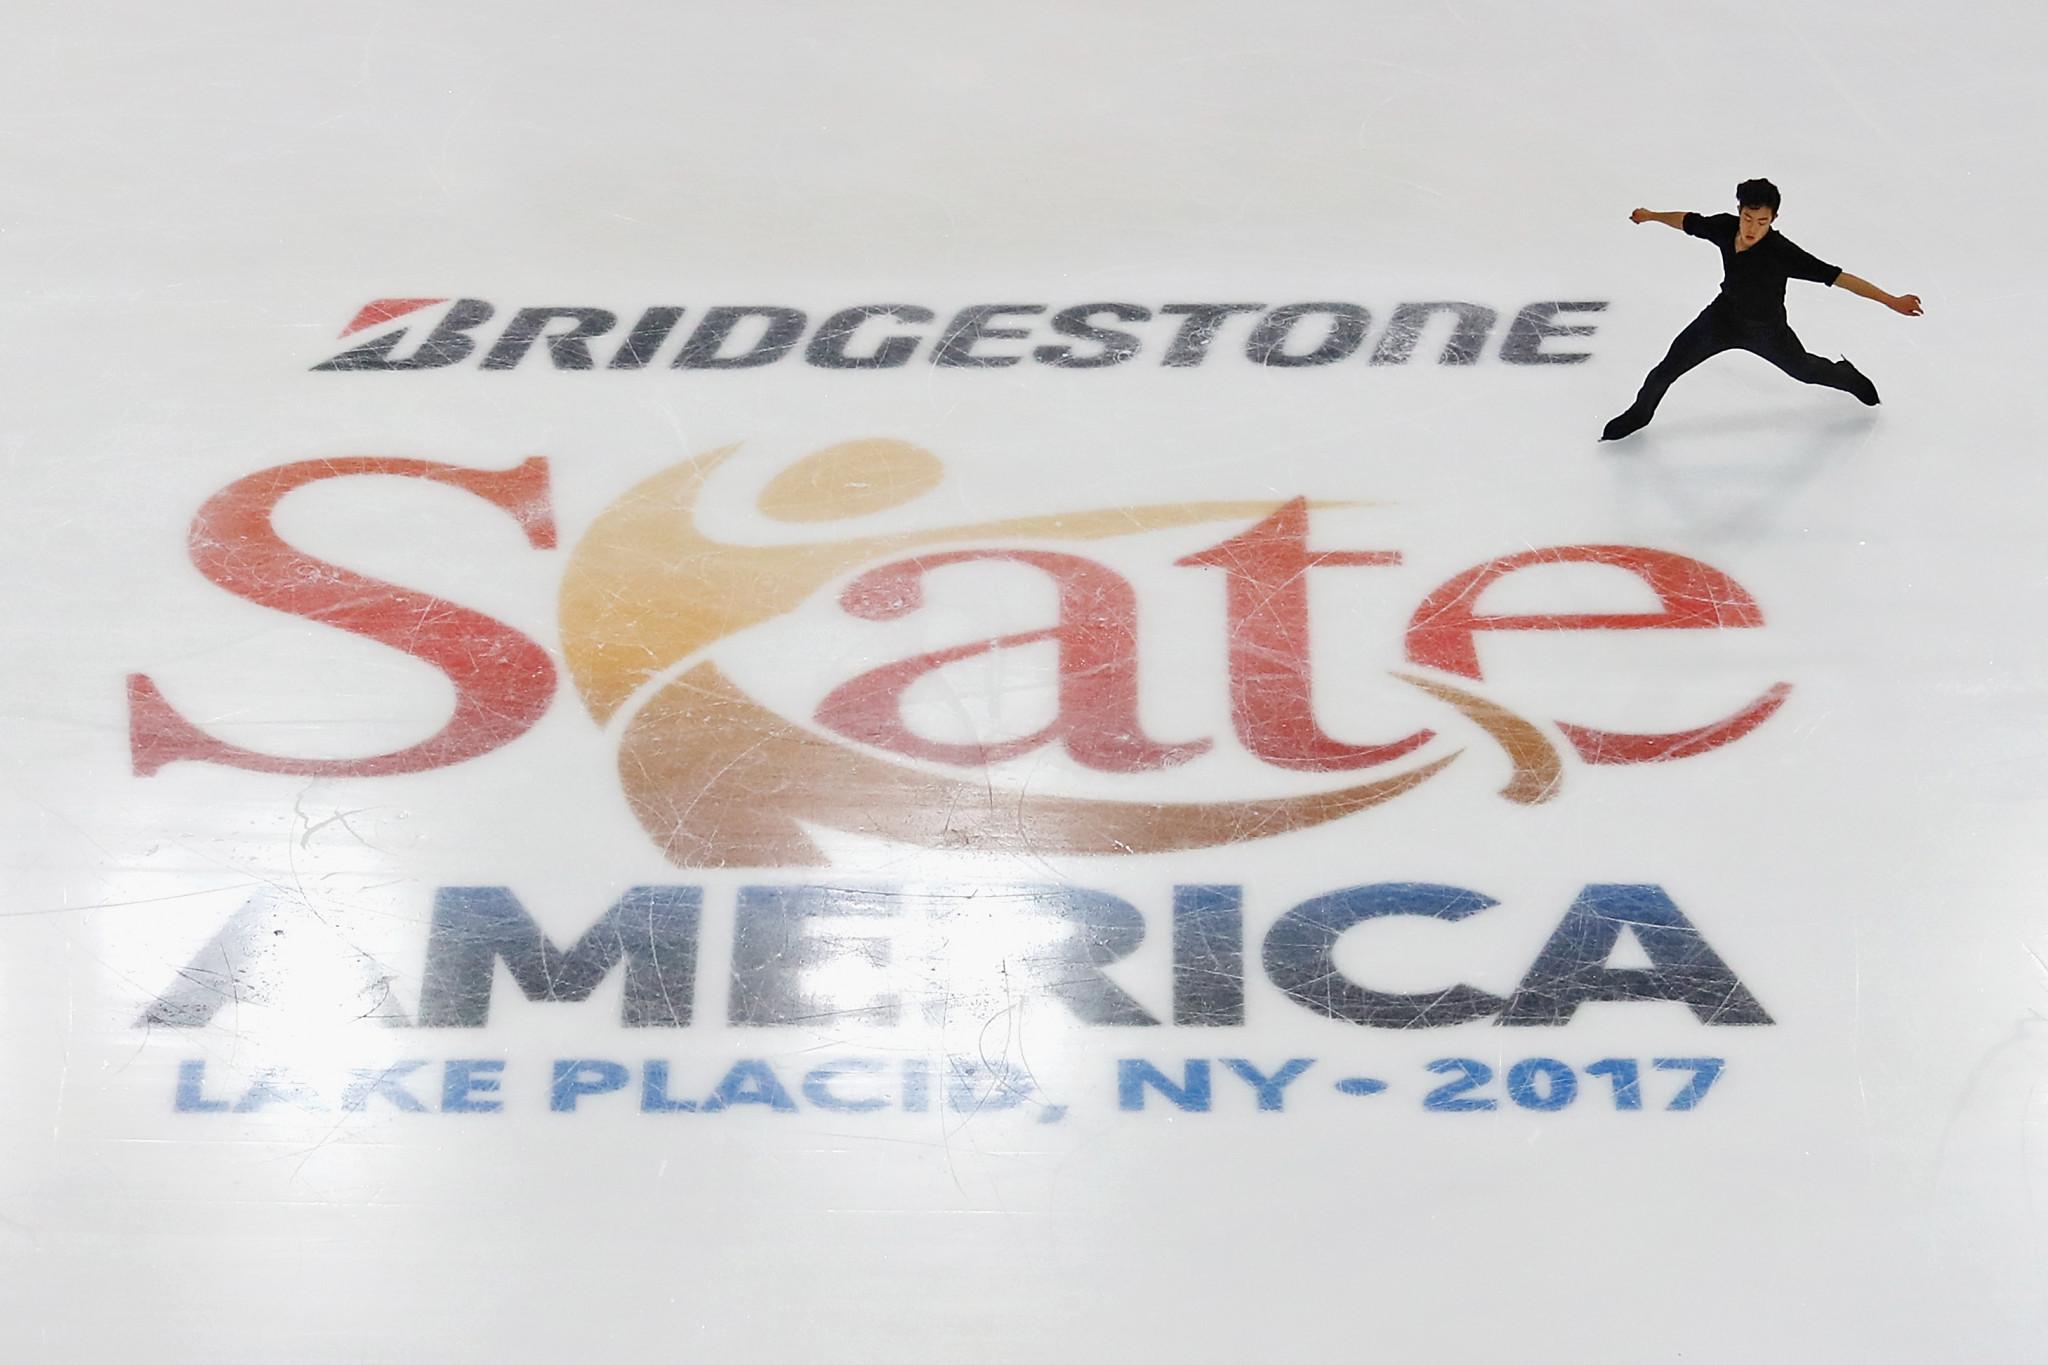 Chen impresses in short programme as Skate America begins